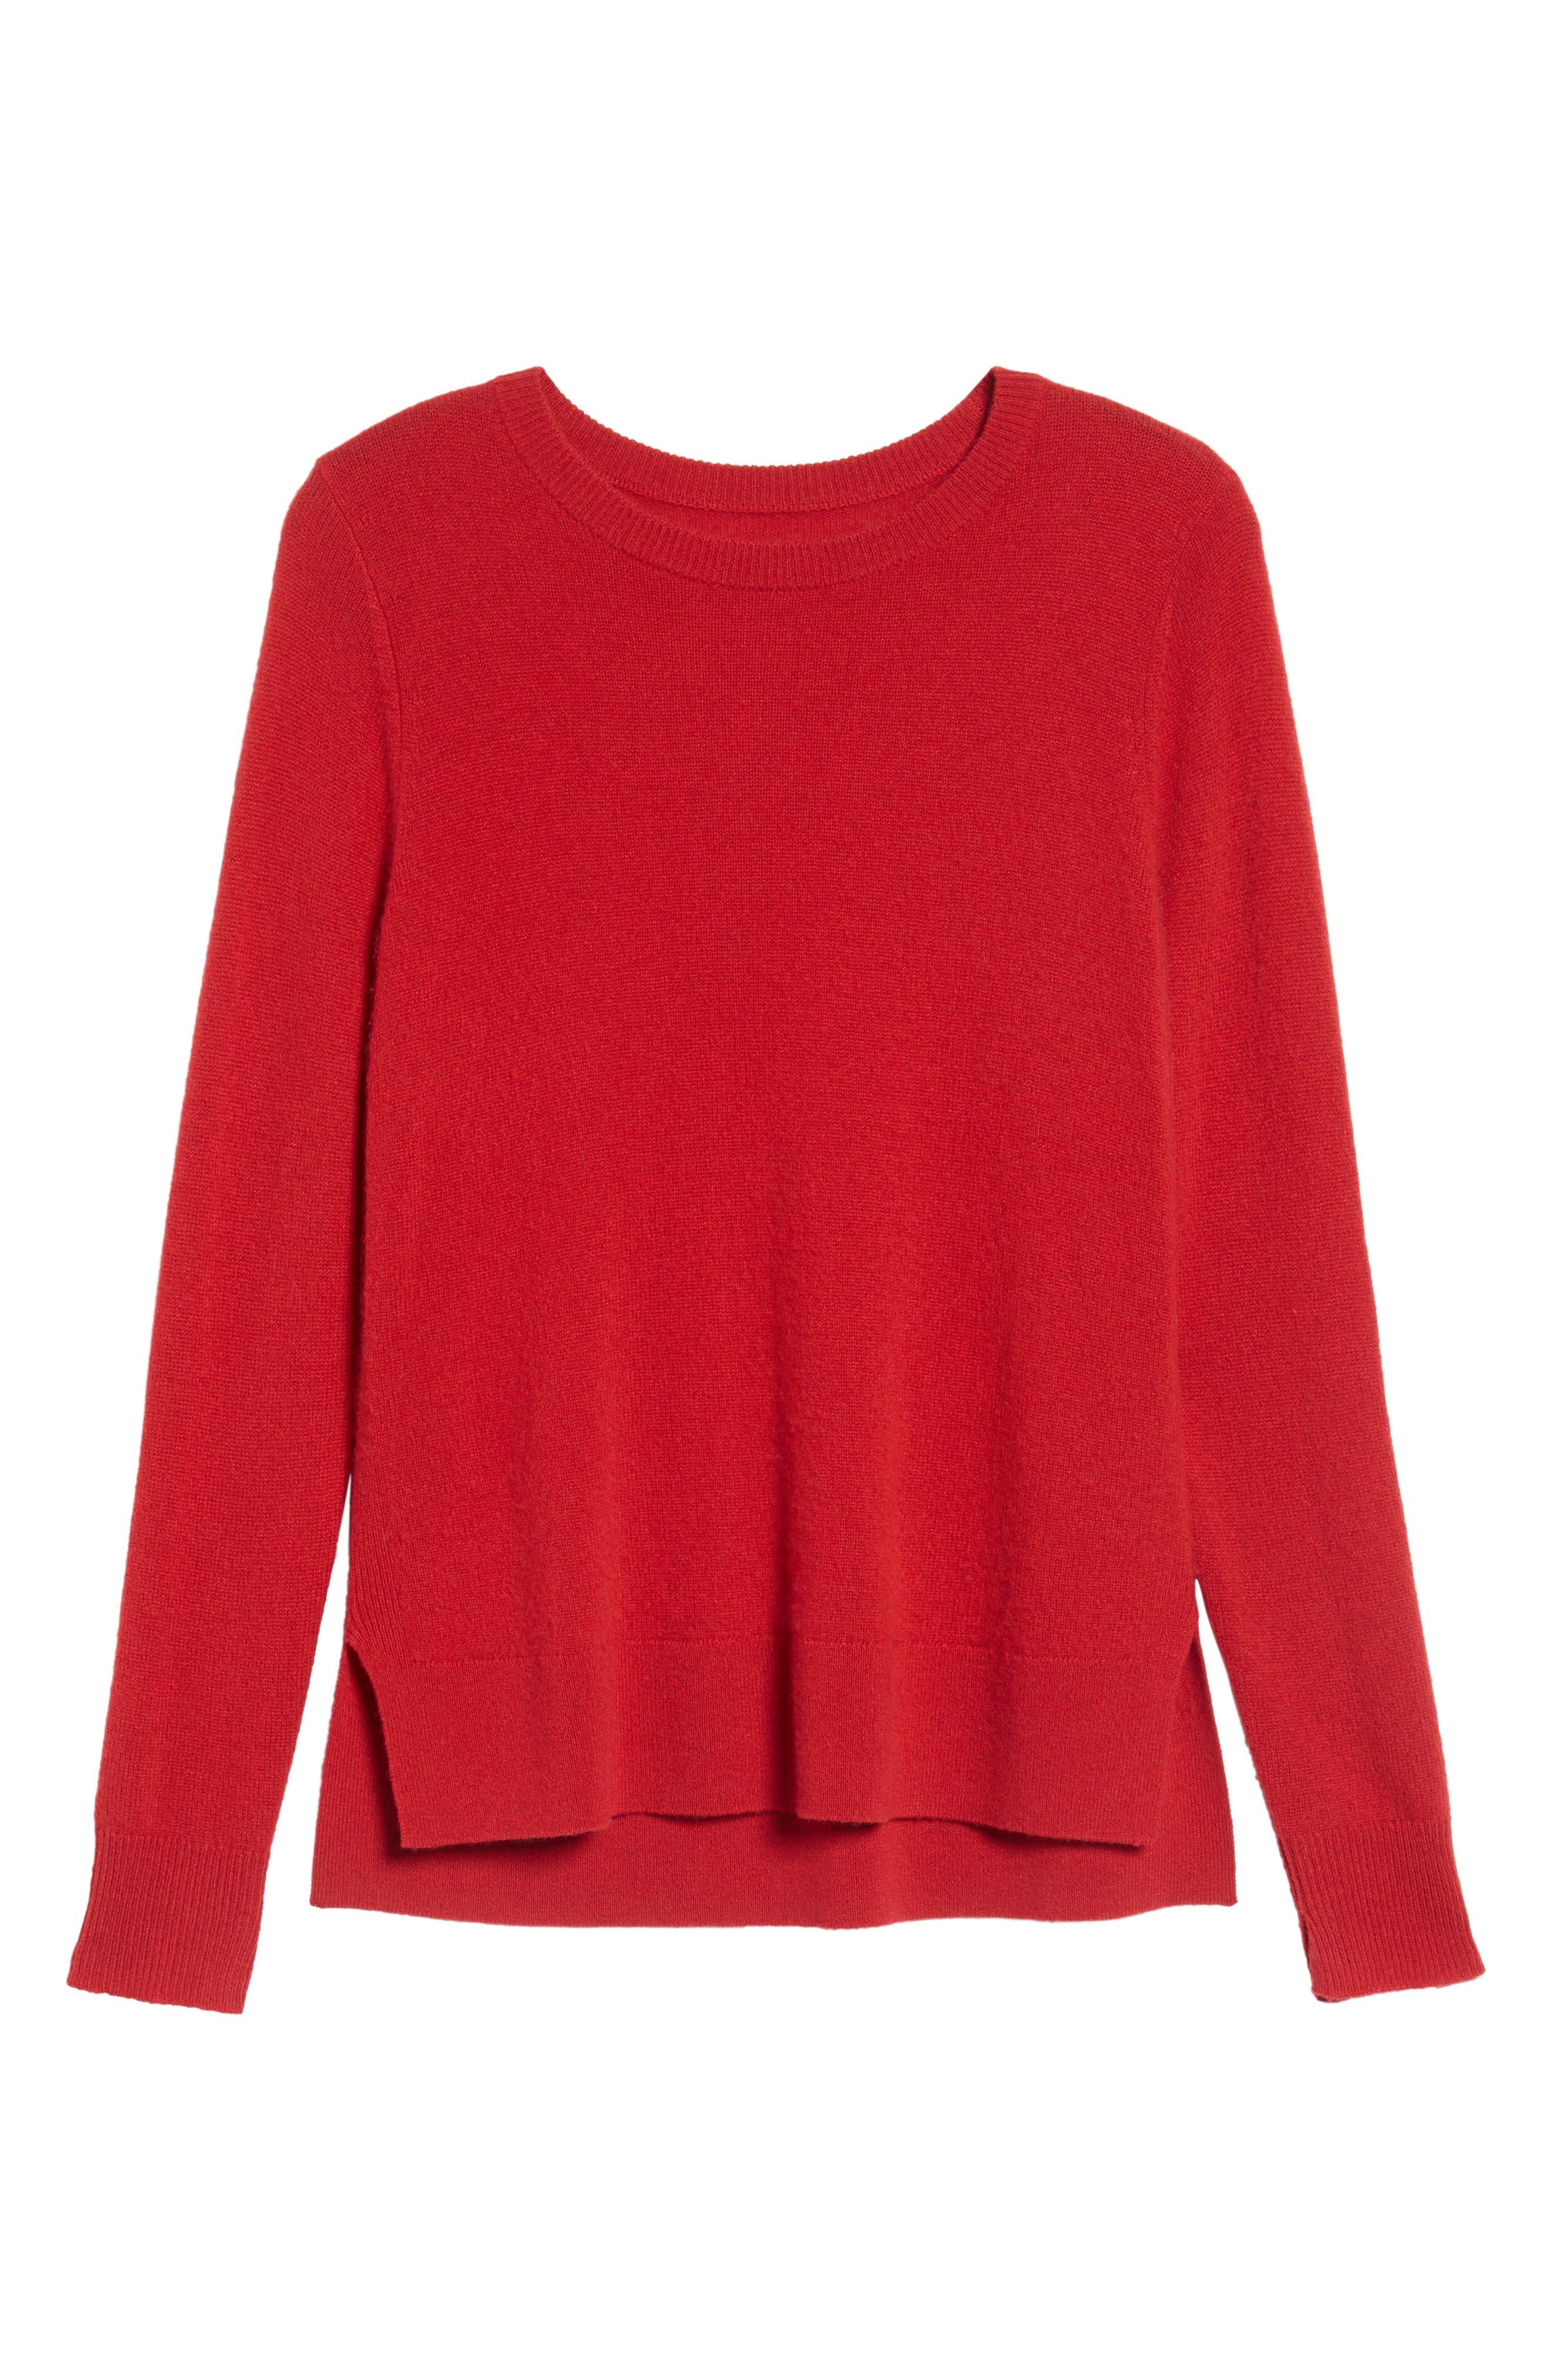 ,                             Crewneck Cashmere Sweater,                             Alternate thumbnail 139, color,                             600